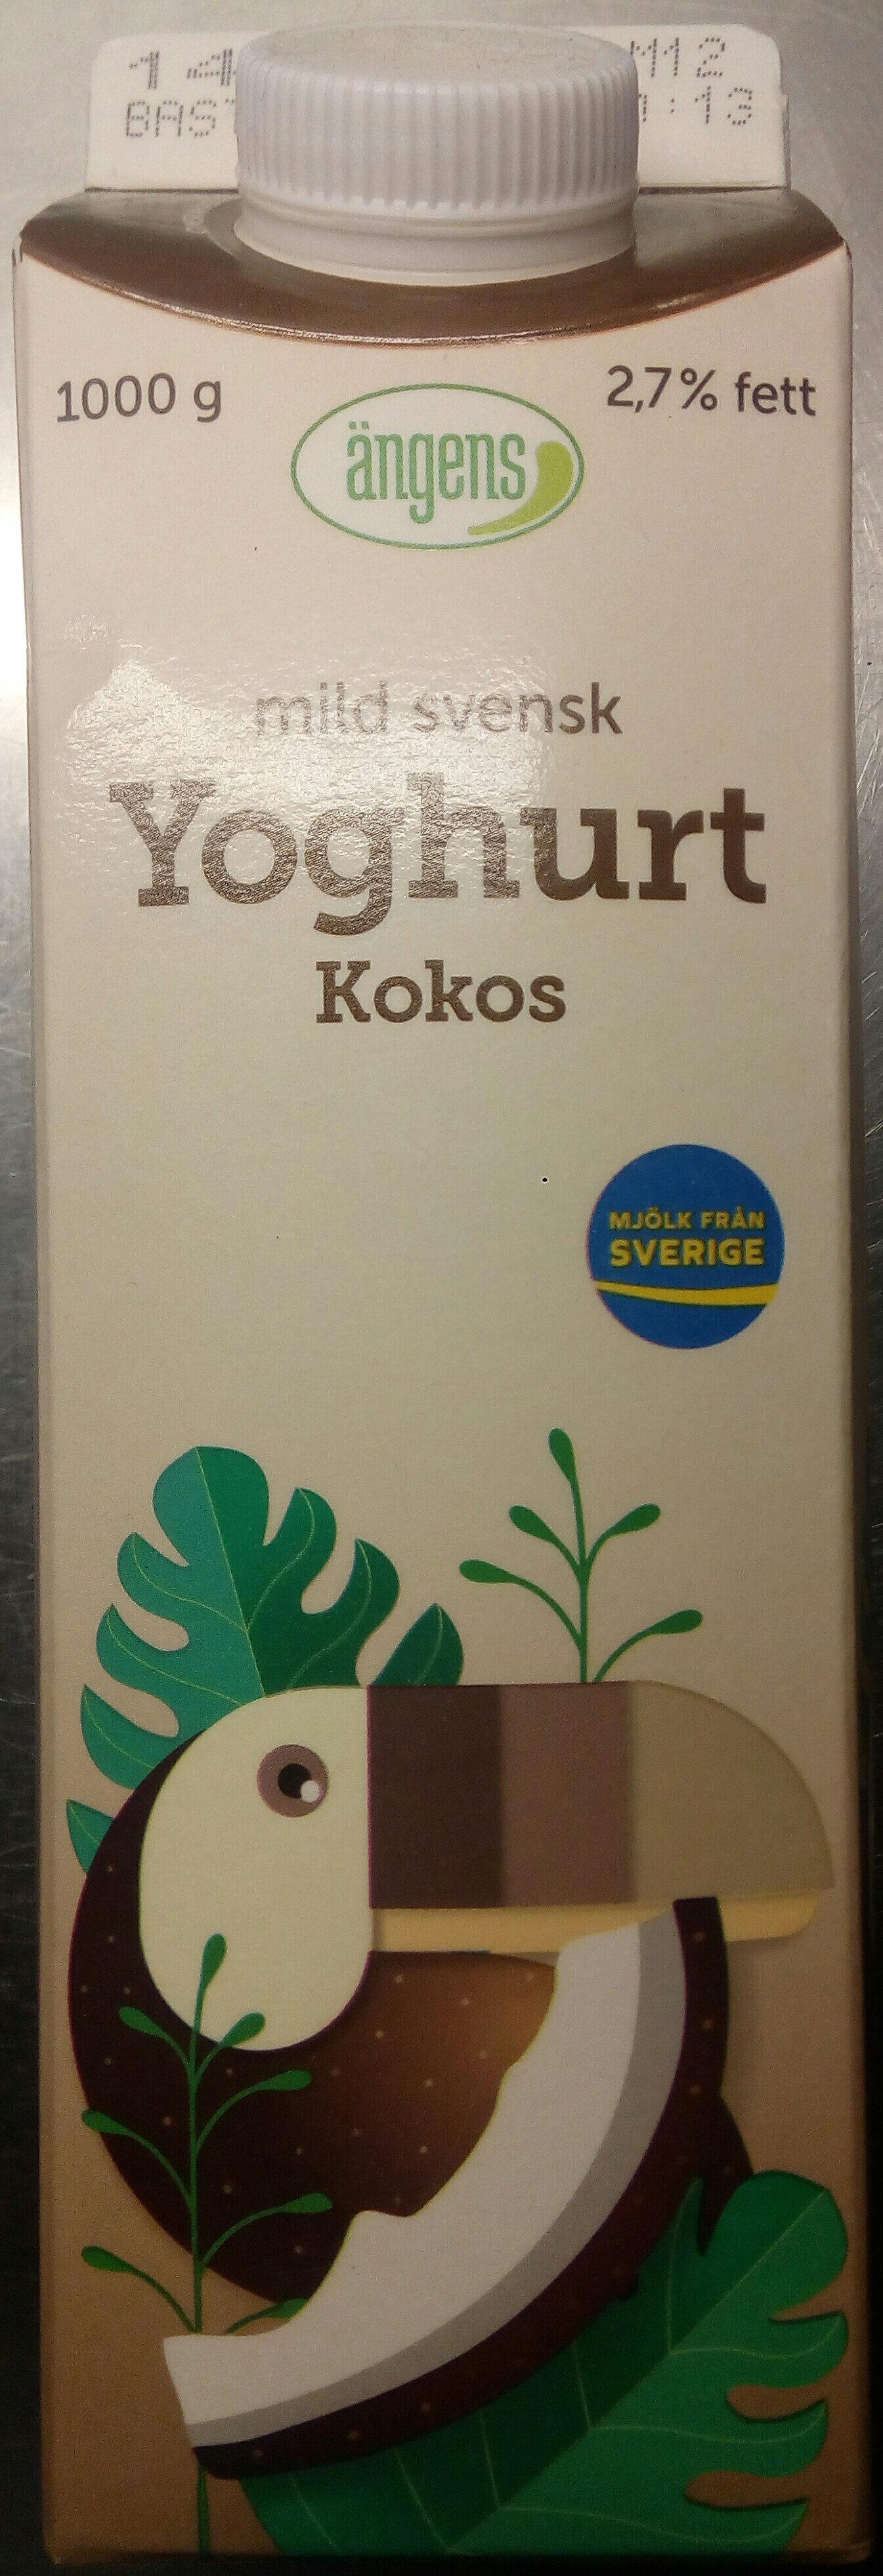 Ängens mild svensk Yoghurt Kokos - Produit - sv